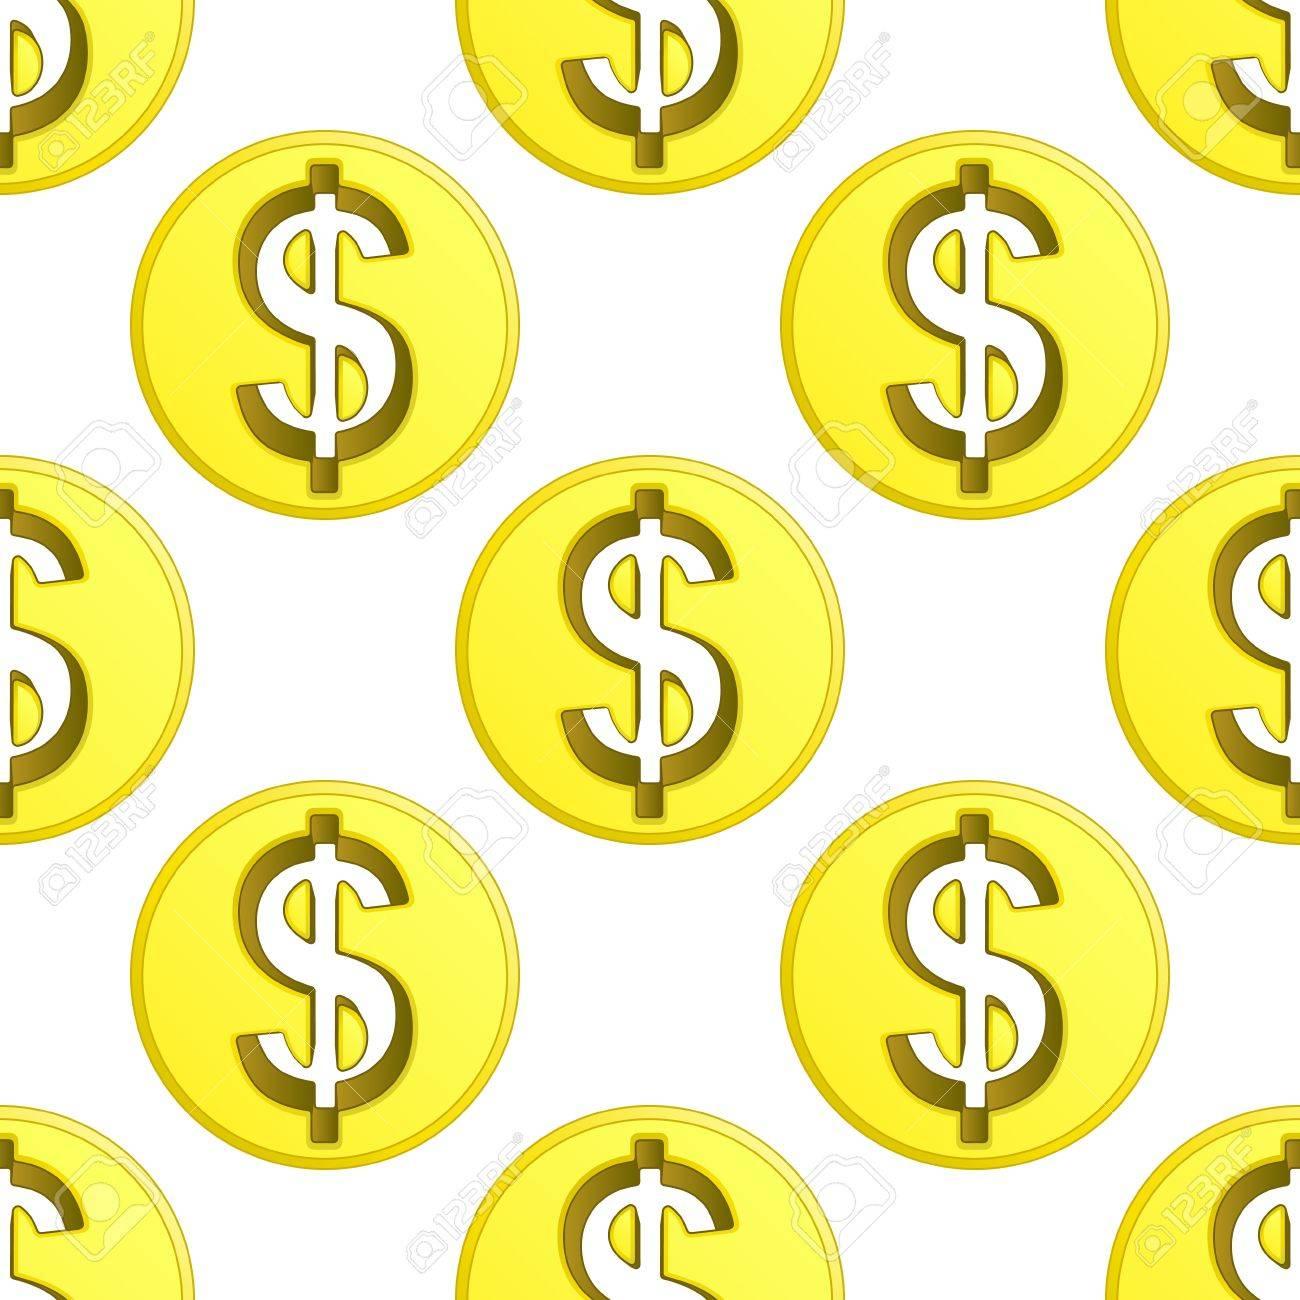 dollar golden coin symbol pattern tile illustration Stock Vector - 18827915